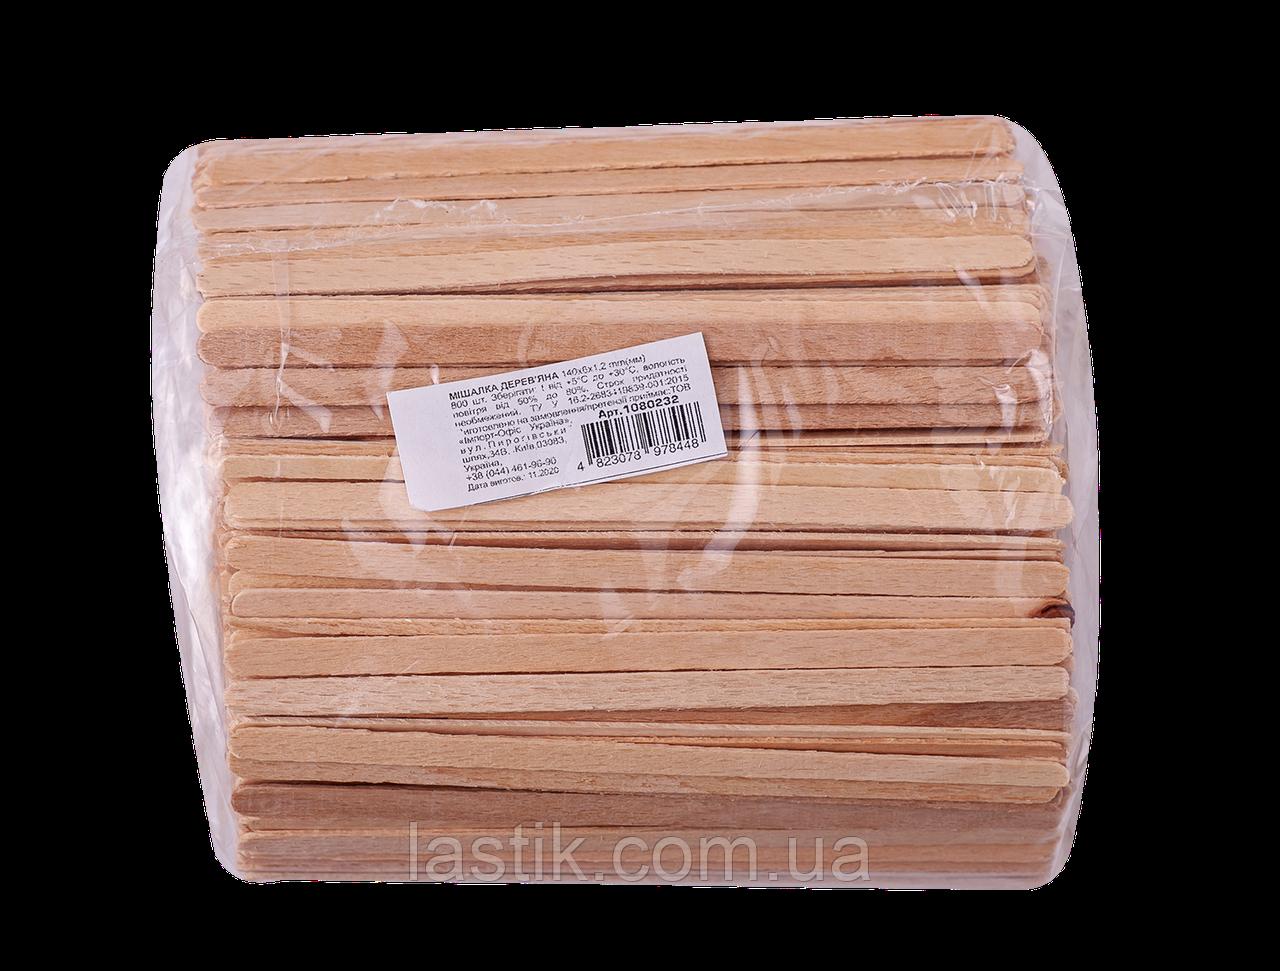 /Мешалка 14 см 800шт/уп деревянная одноразовая BuroClean